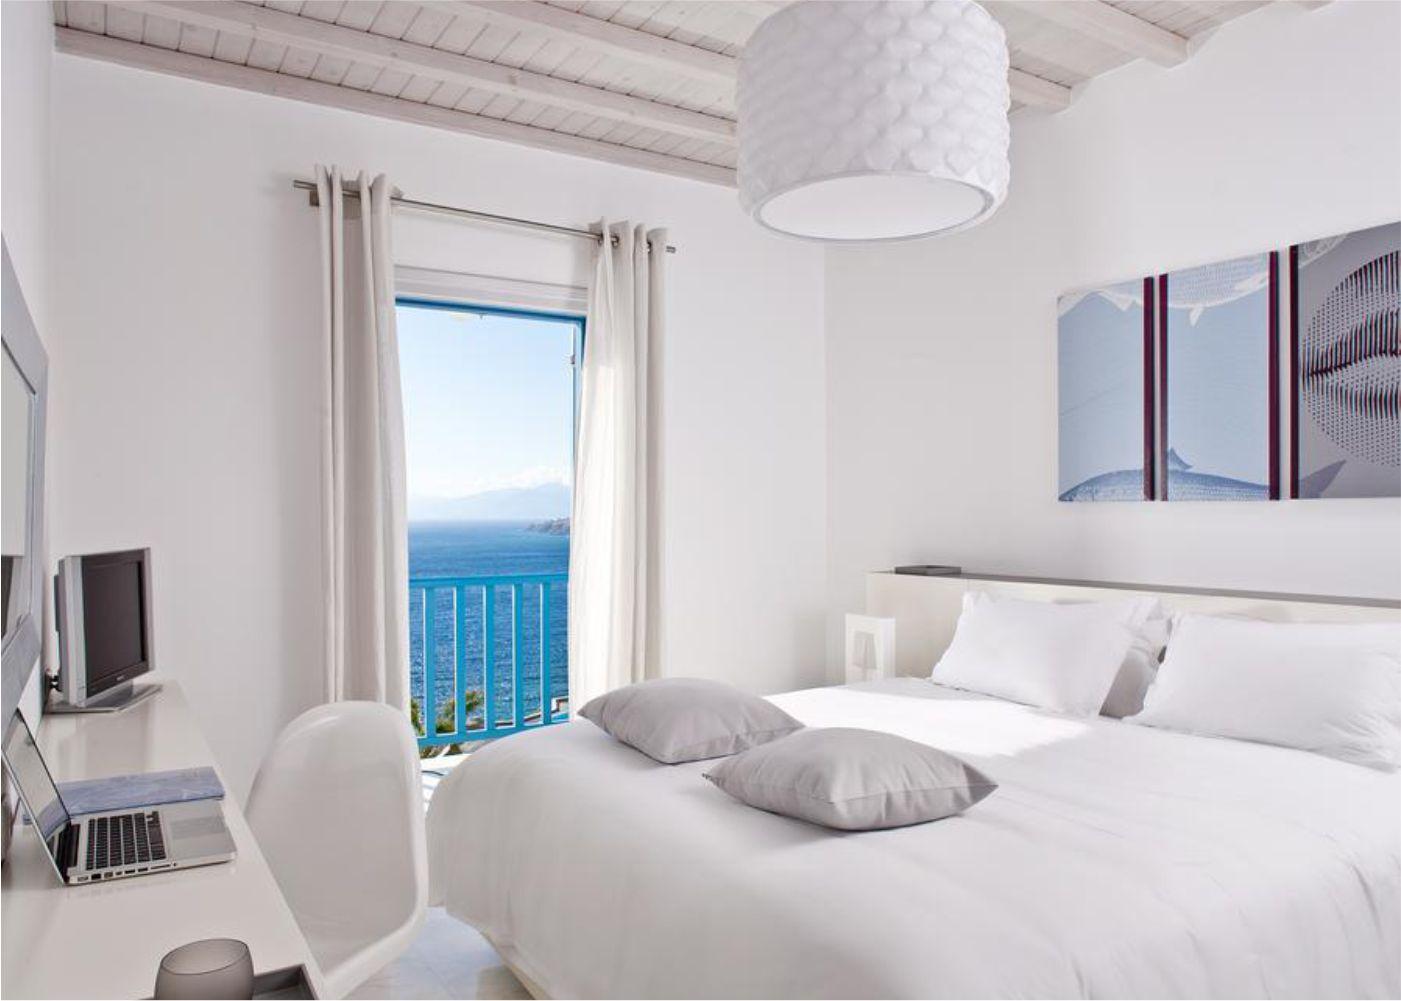 paraskevi-interior-kouros-hotel-5